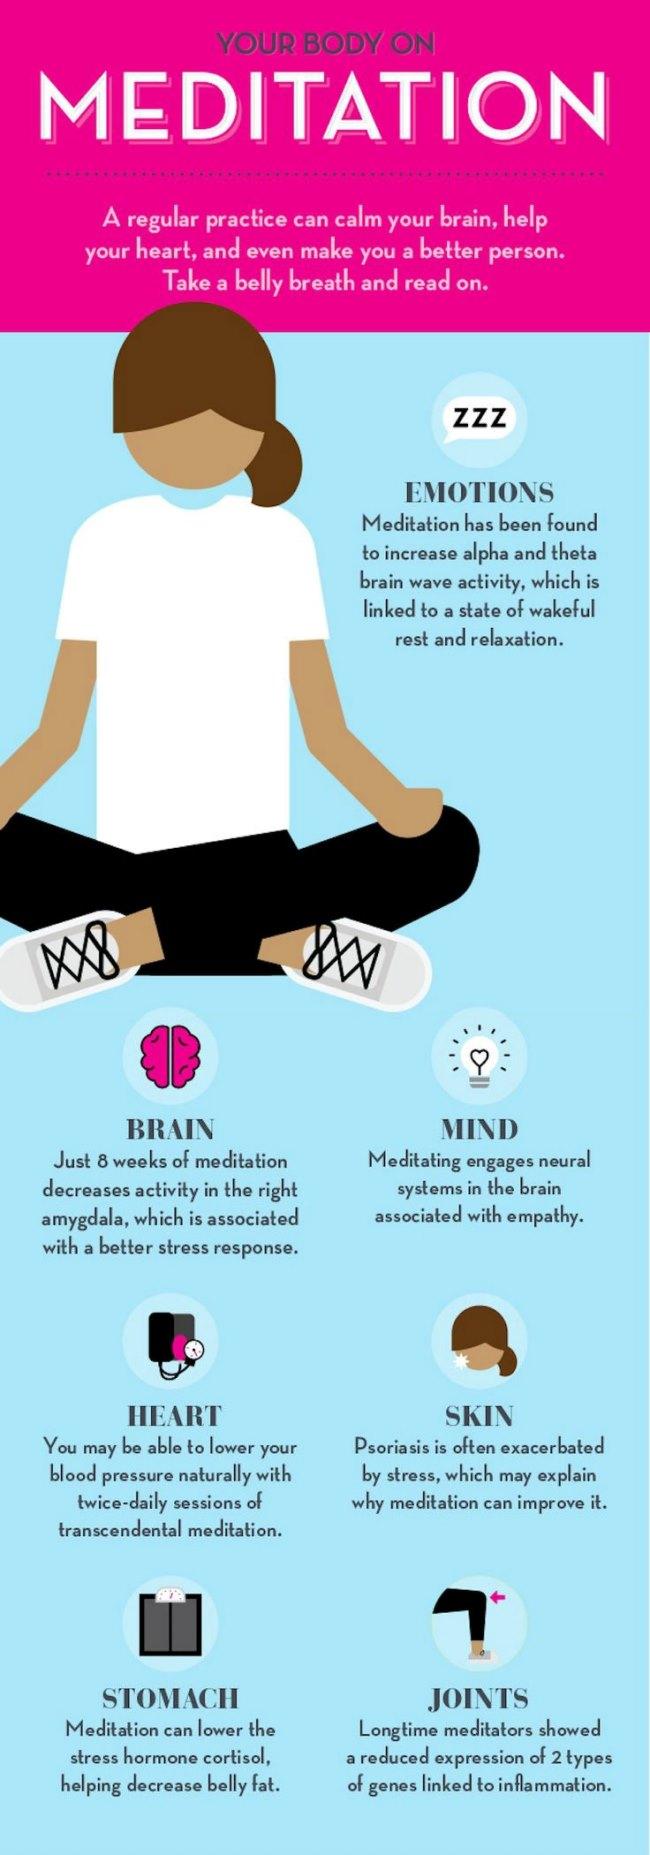 8 weeks meditation benefits